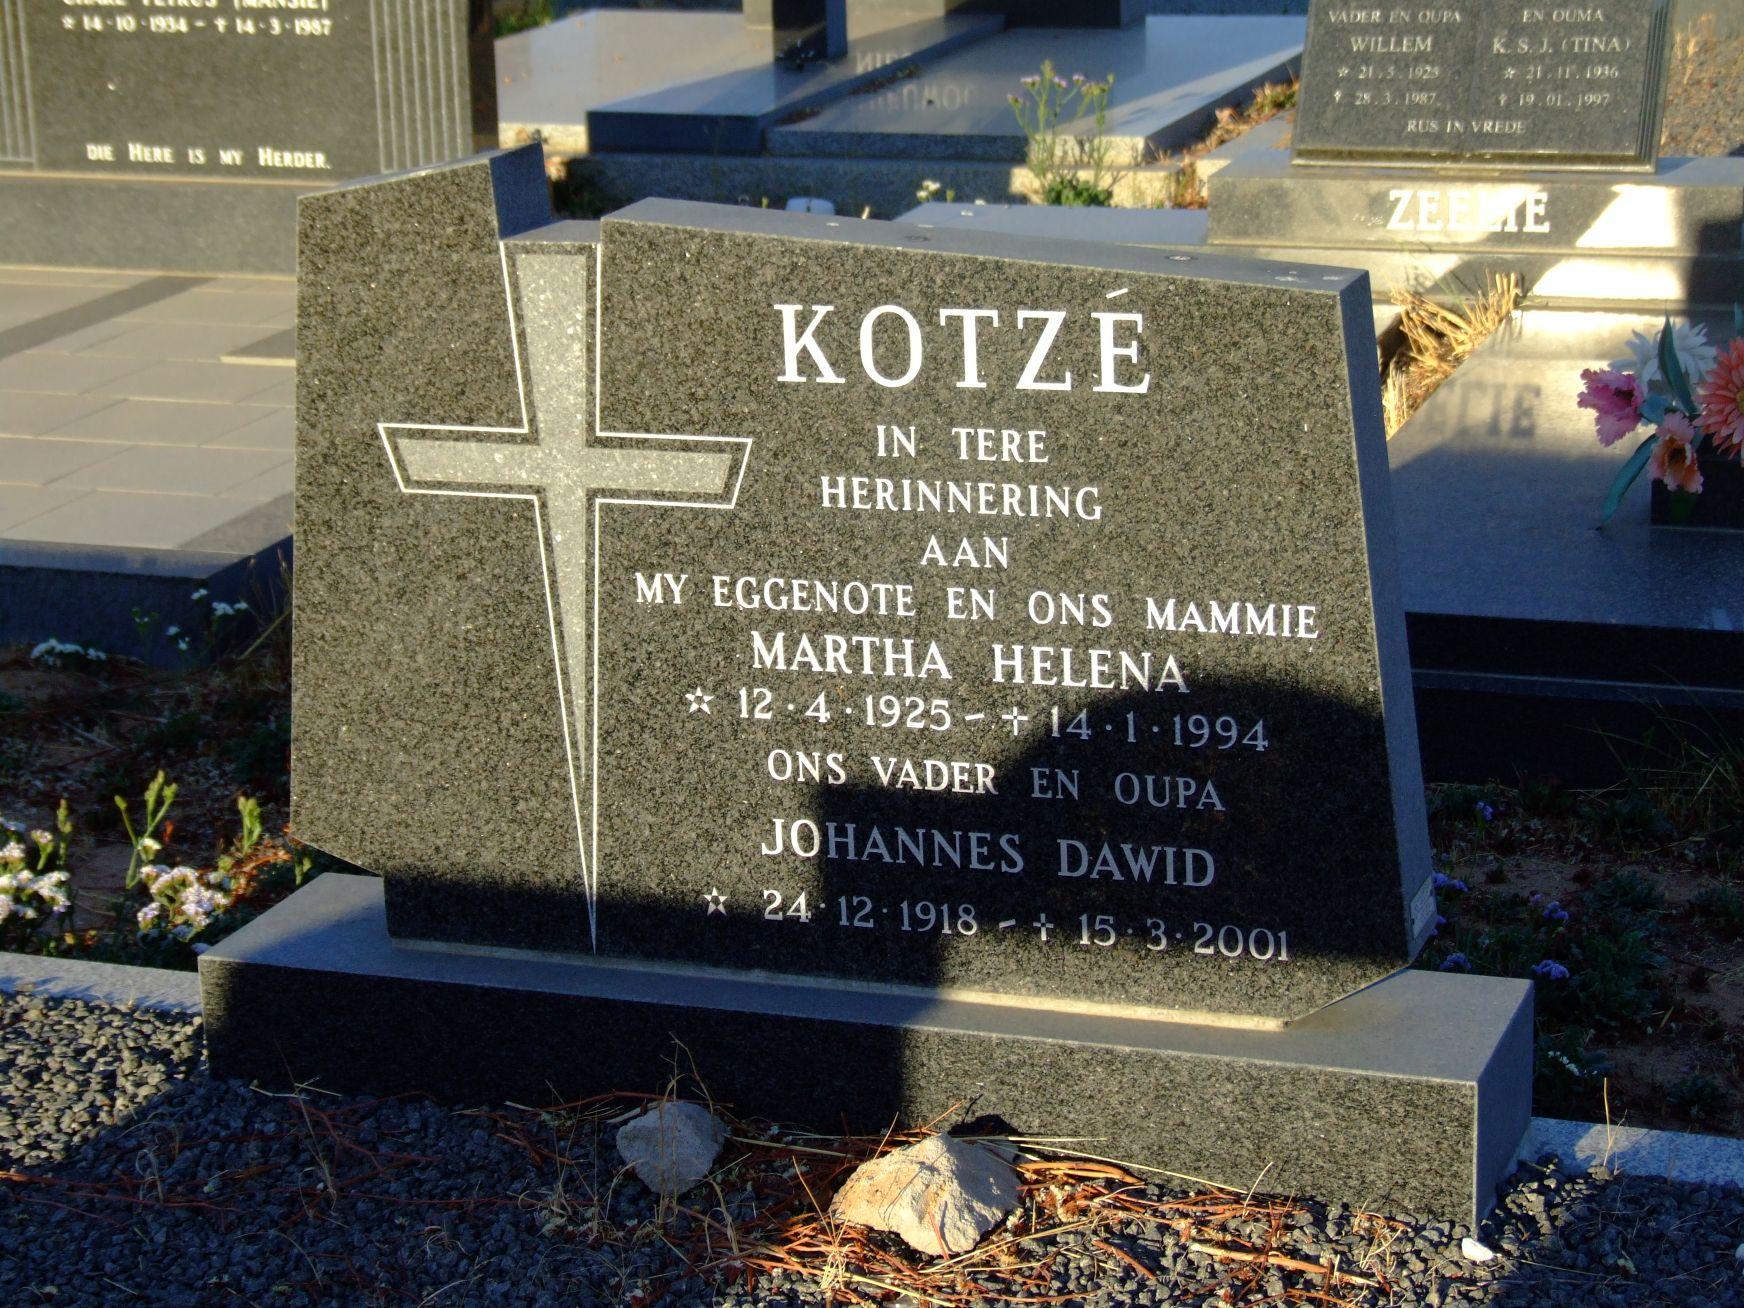 Kotze, Martha Helena + Kotze, Johannes Dawid